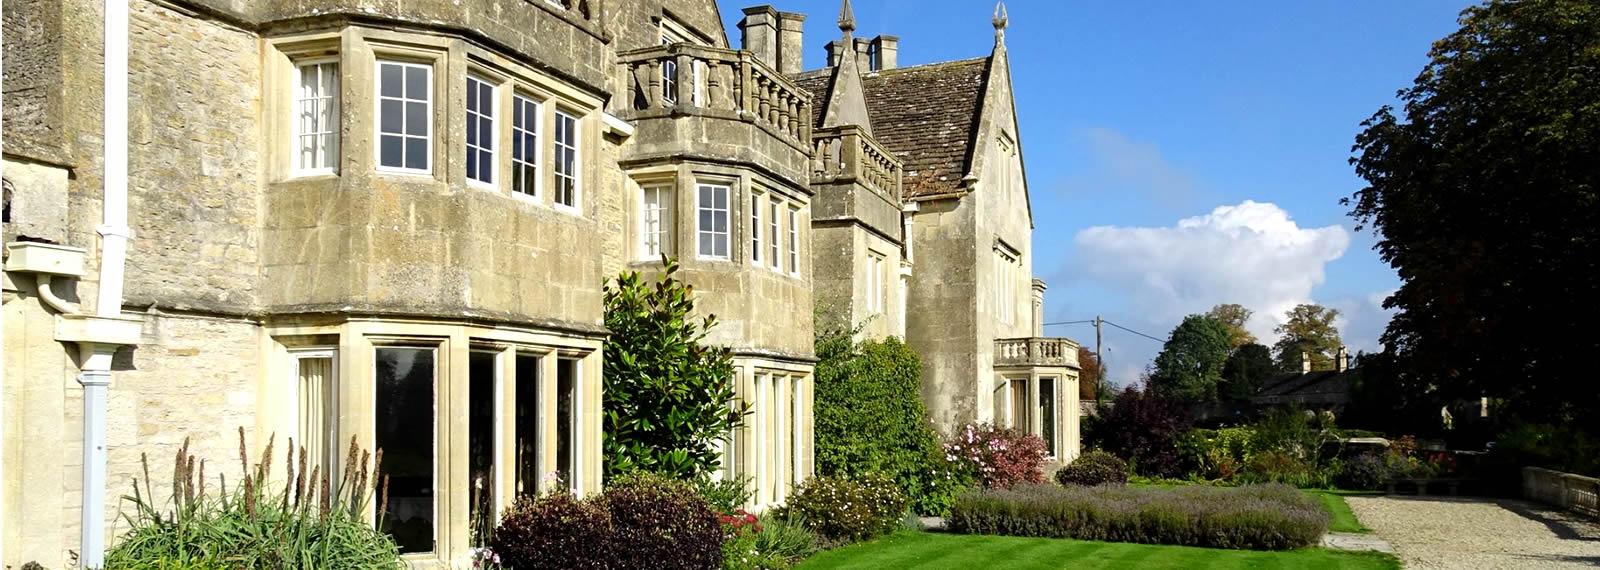 Bradford Upon Avon, near Bath